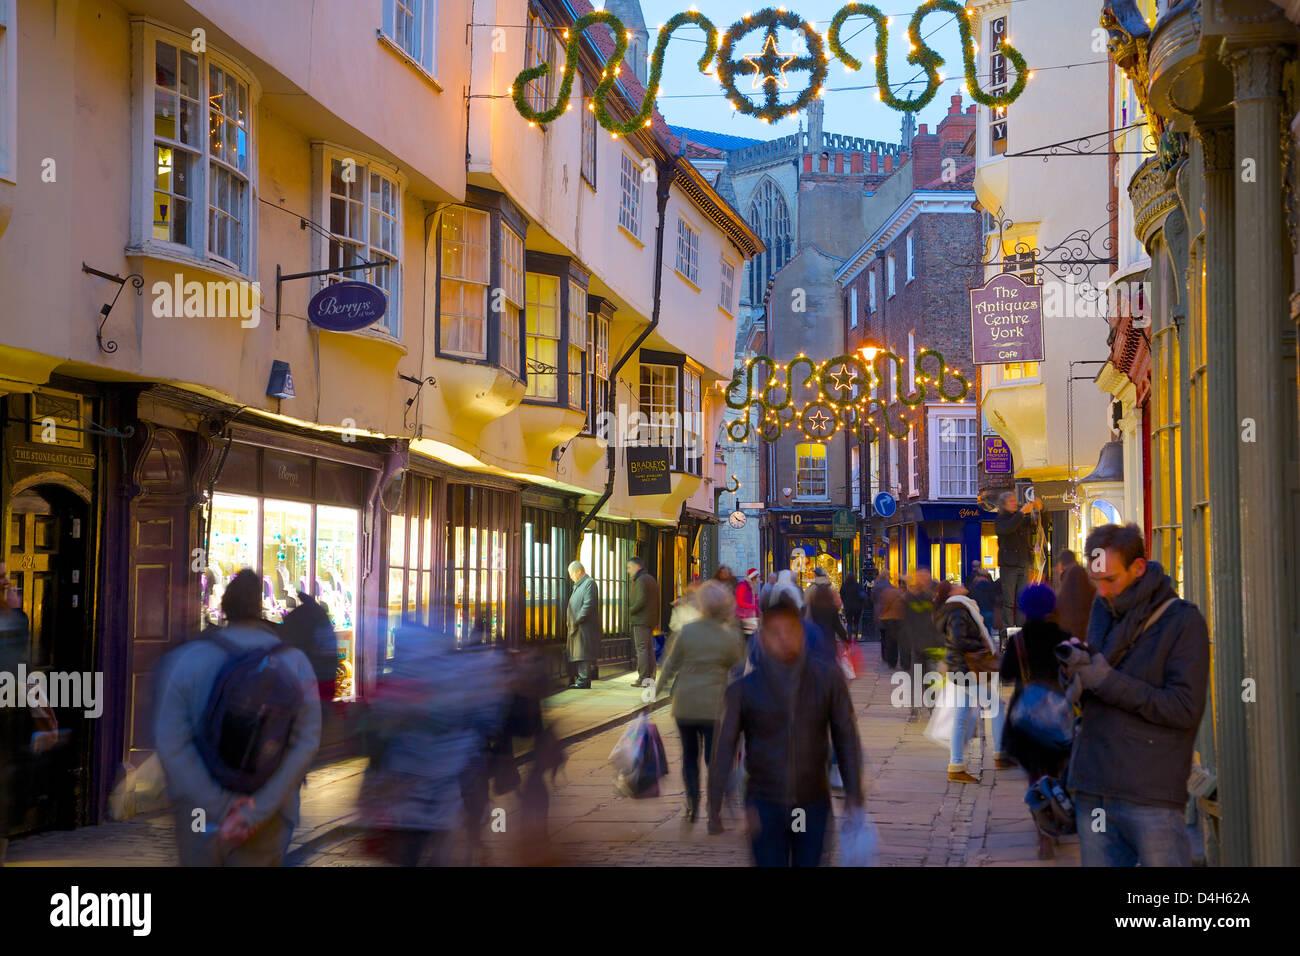 Colliergate et Minster à Noël, York, Yorkshire, Angleterre, Royaume-Uni Photo Stock